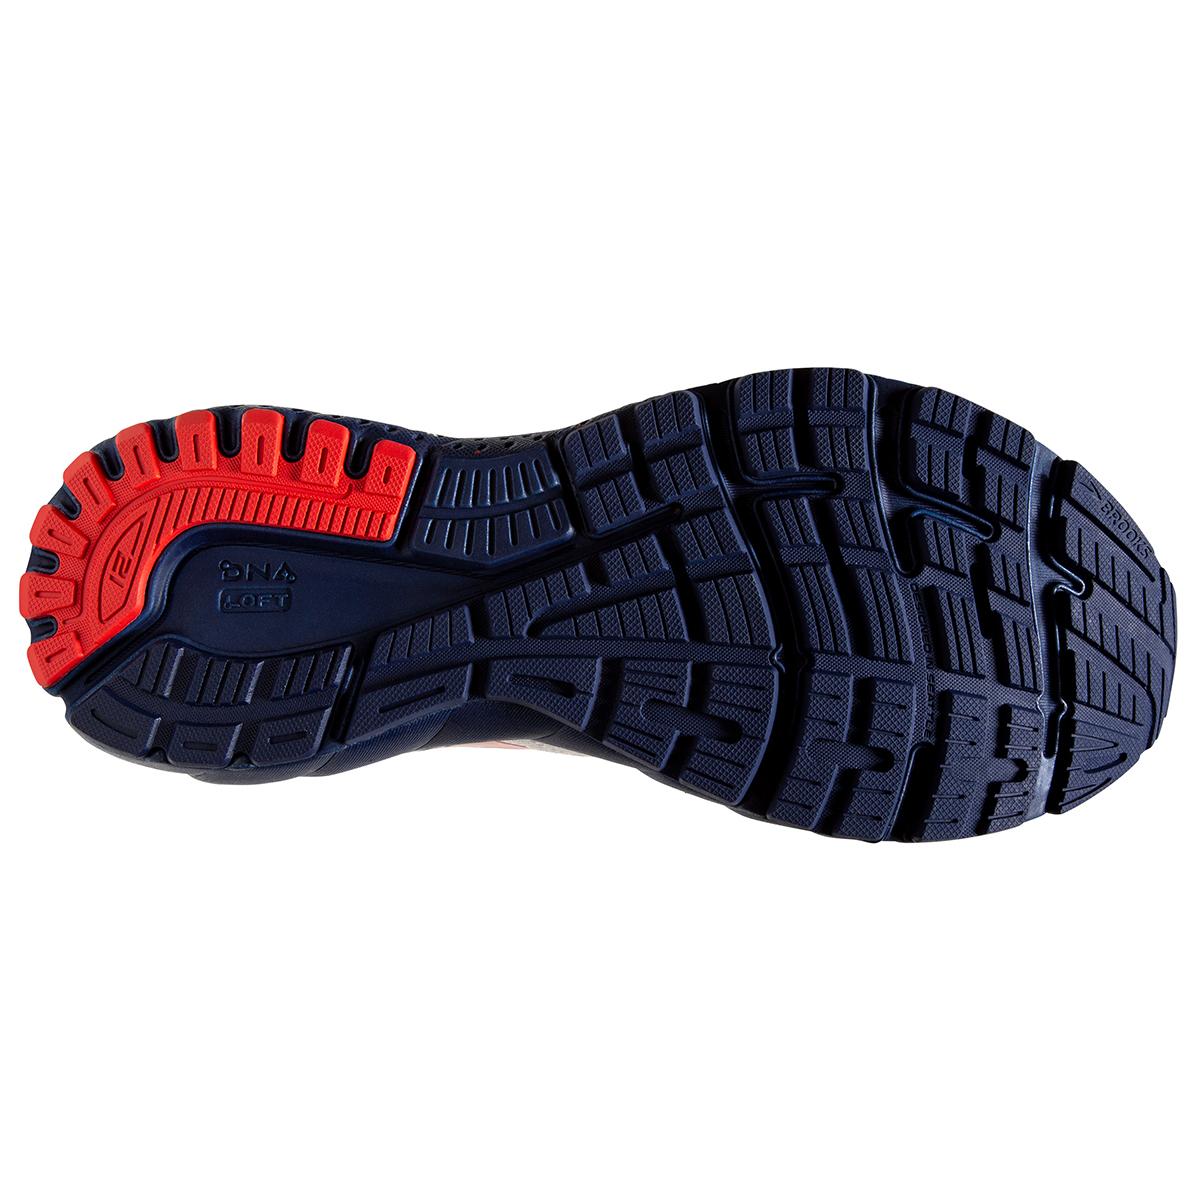 Men's Brooks Adrenaline GTS 21 Running Shoe - Color: White/Blue/Red - Size: 7 - Width: Regular, White/Blue/Red, large, image 6